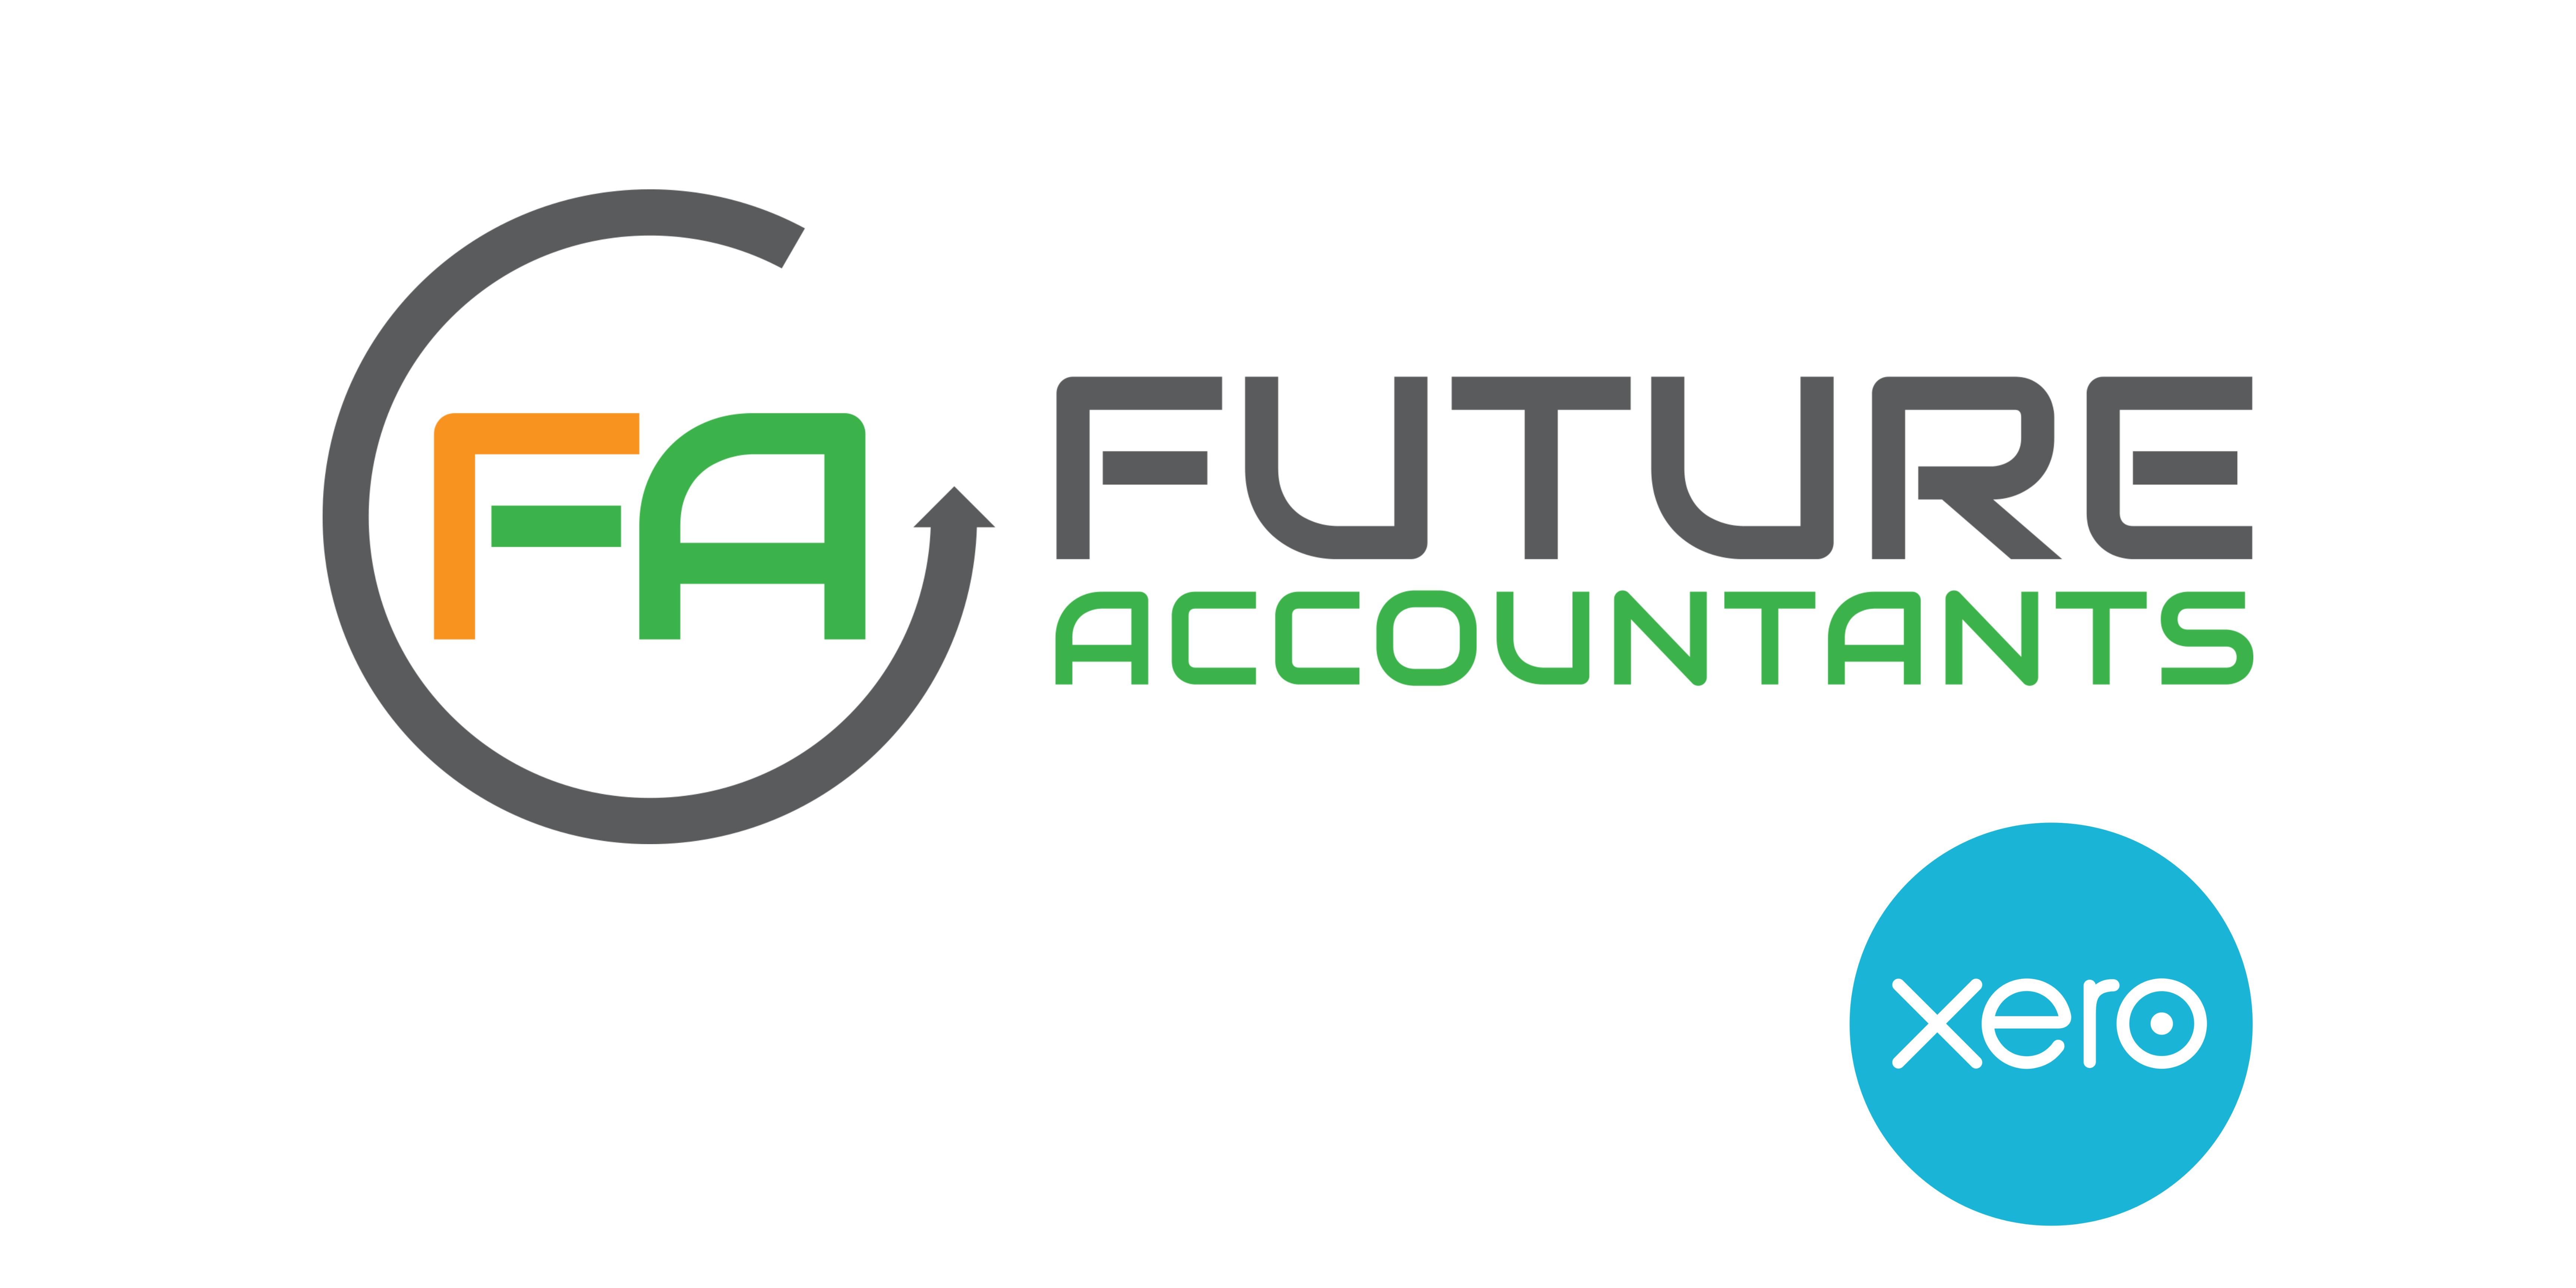 Future Accountants Training Program - Xero Only